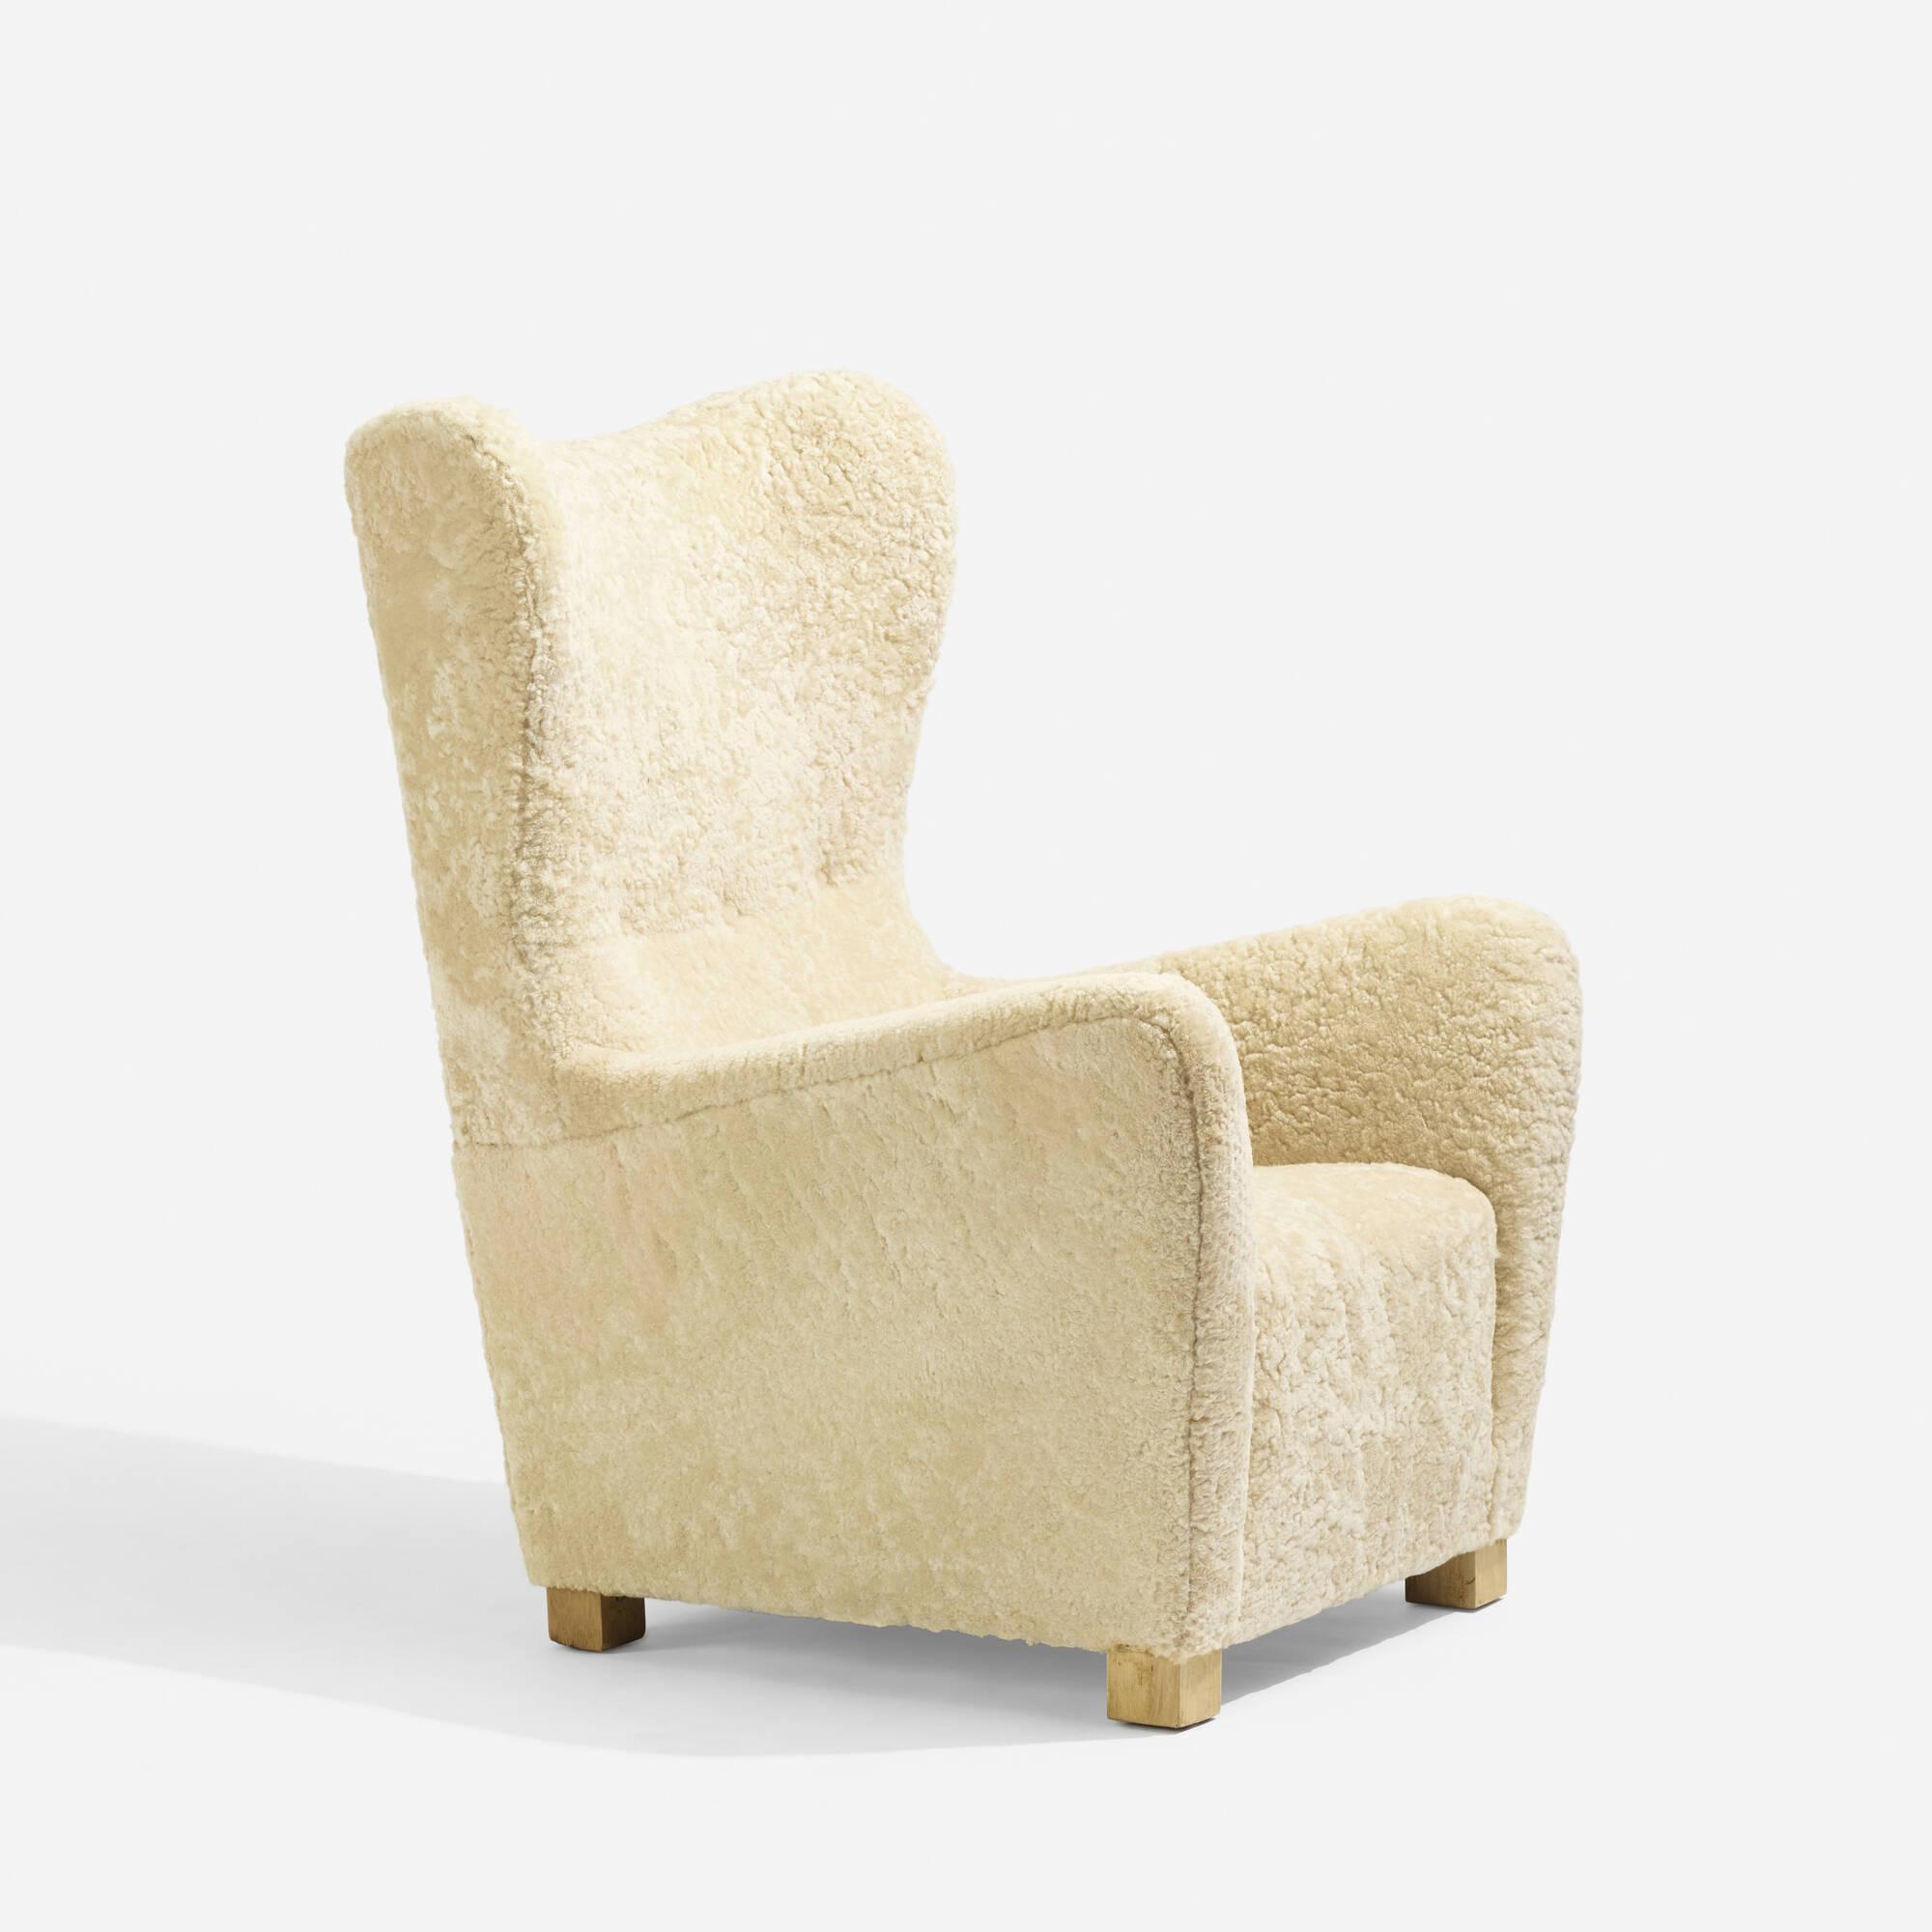 338: Fritz Hansen / Wing Back armchair, model 1672 (3 of 5)